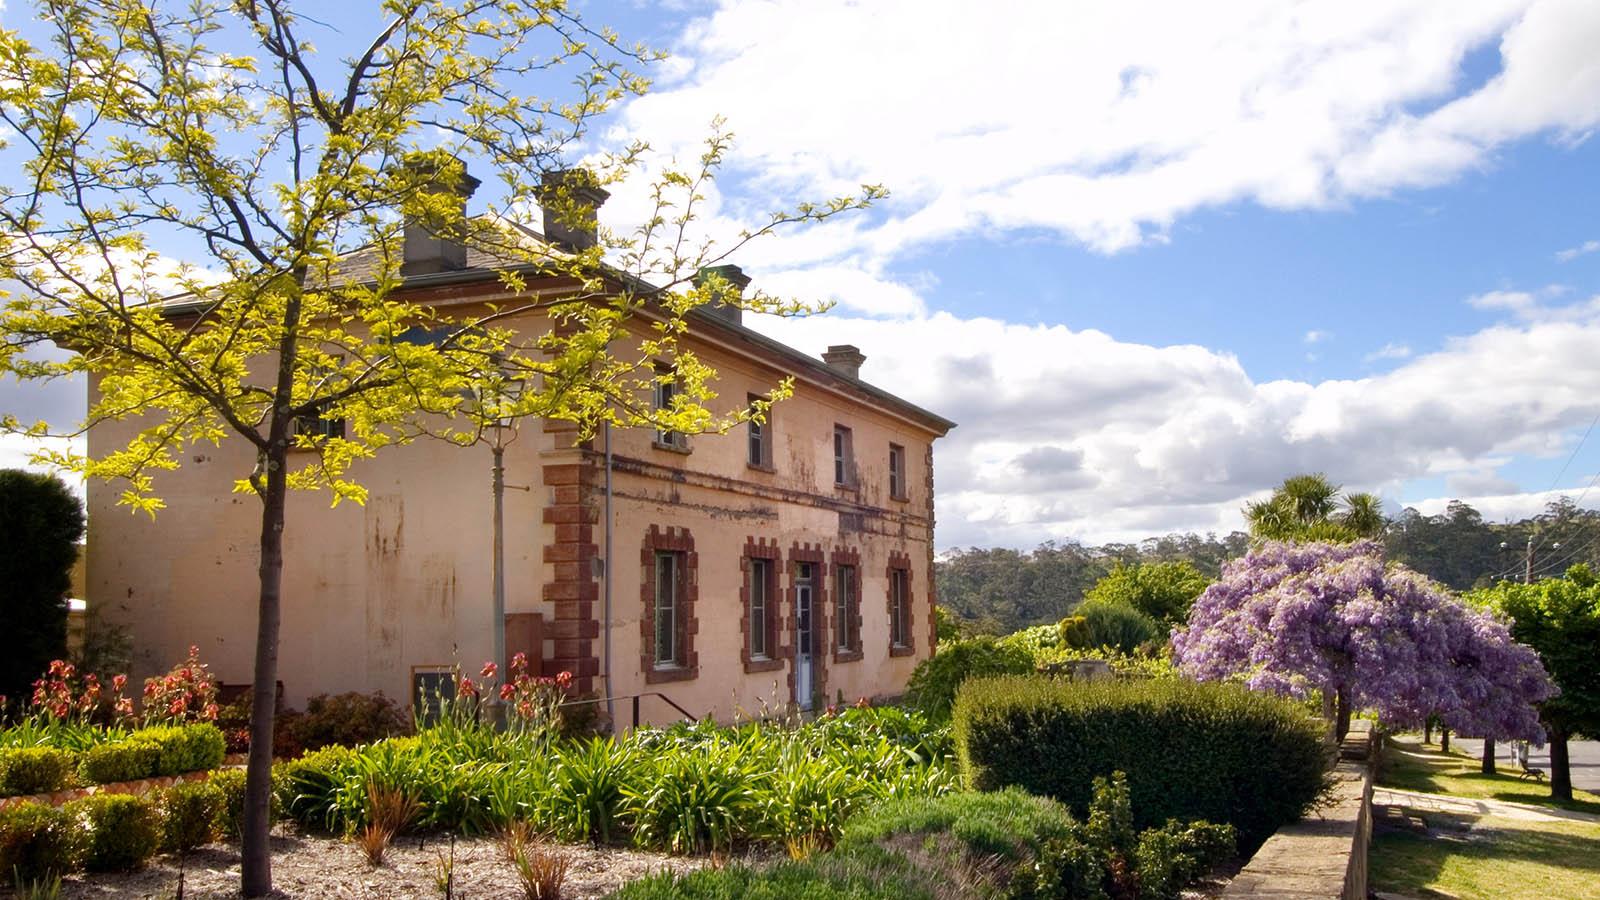 Villa Parma, Daylesford and the Macedon Ranges, Victoria, Australia